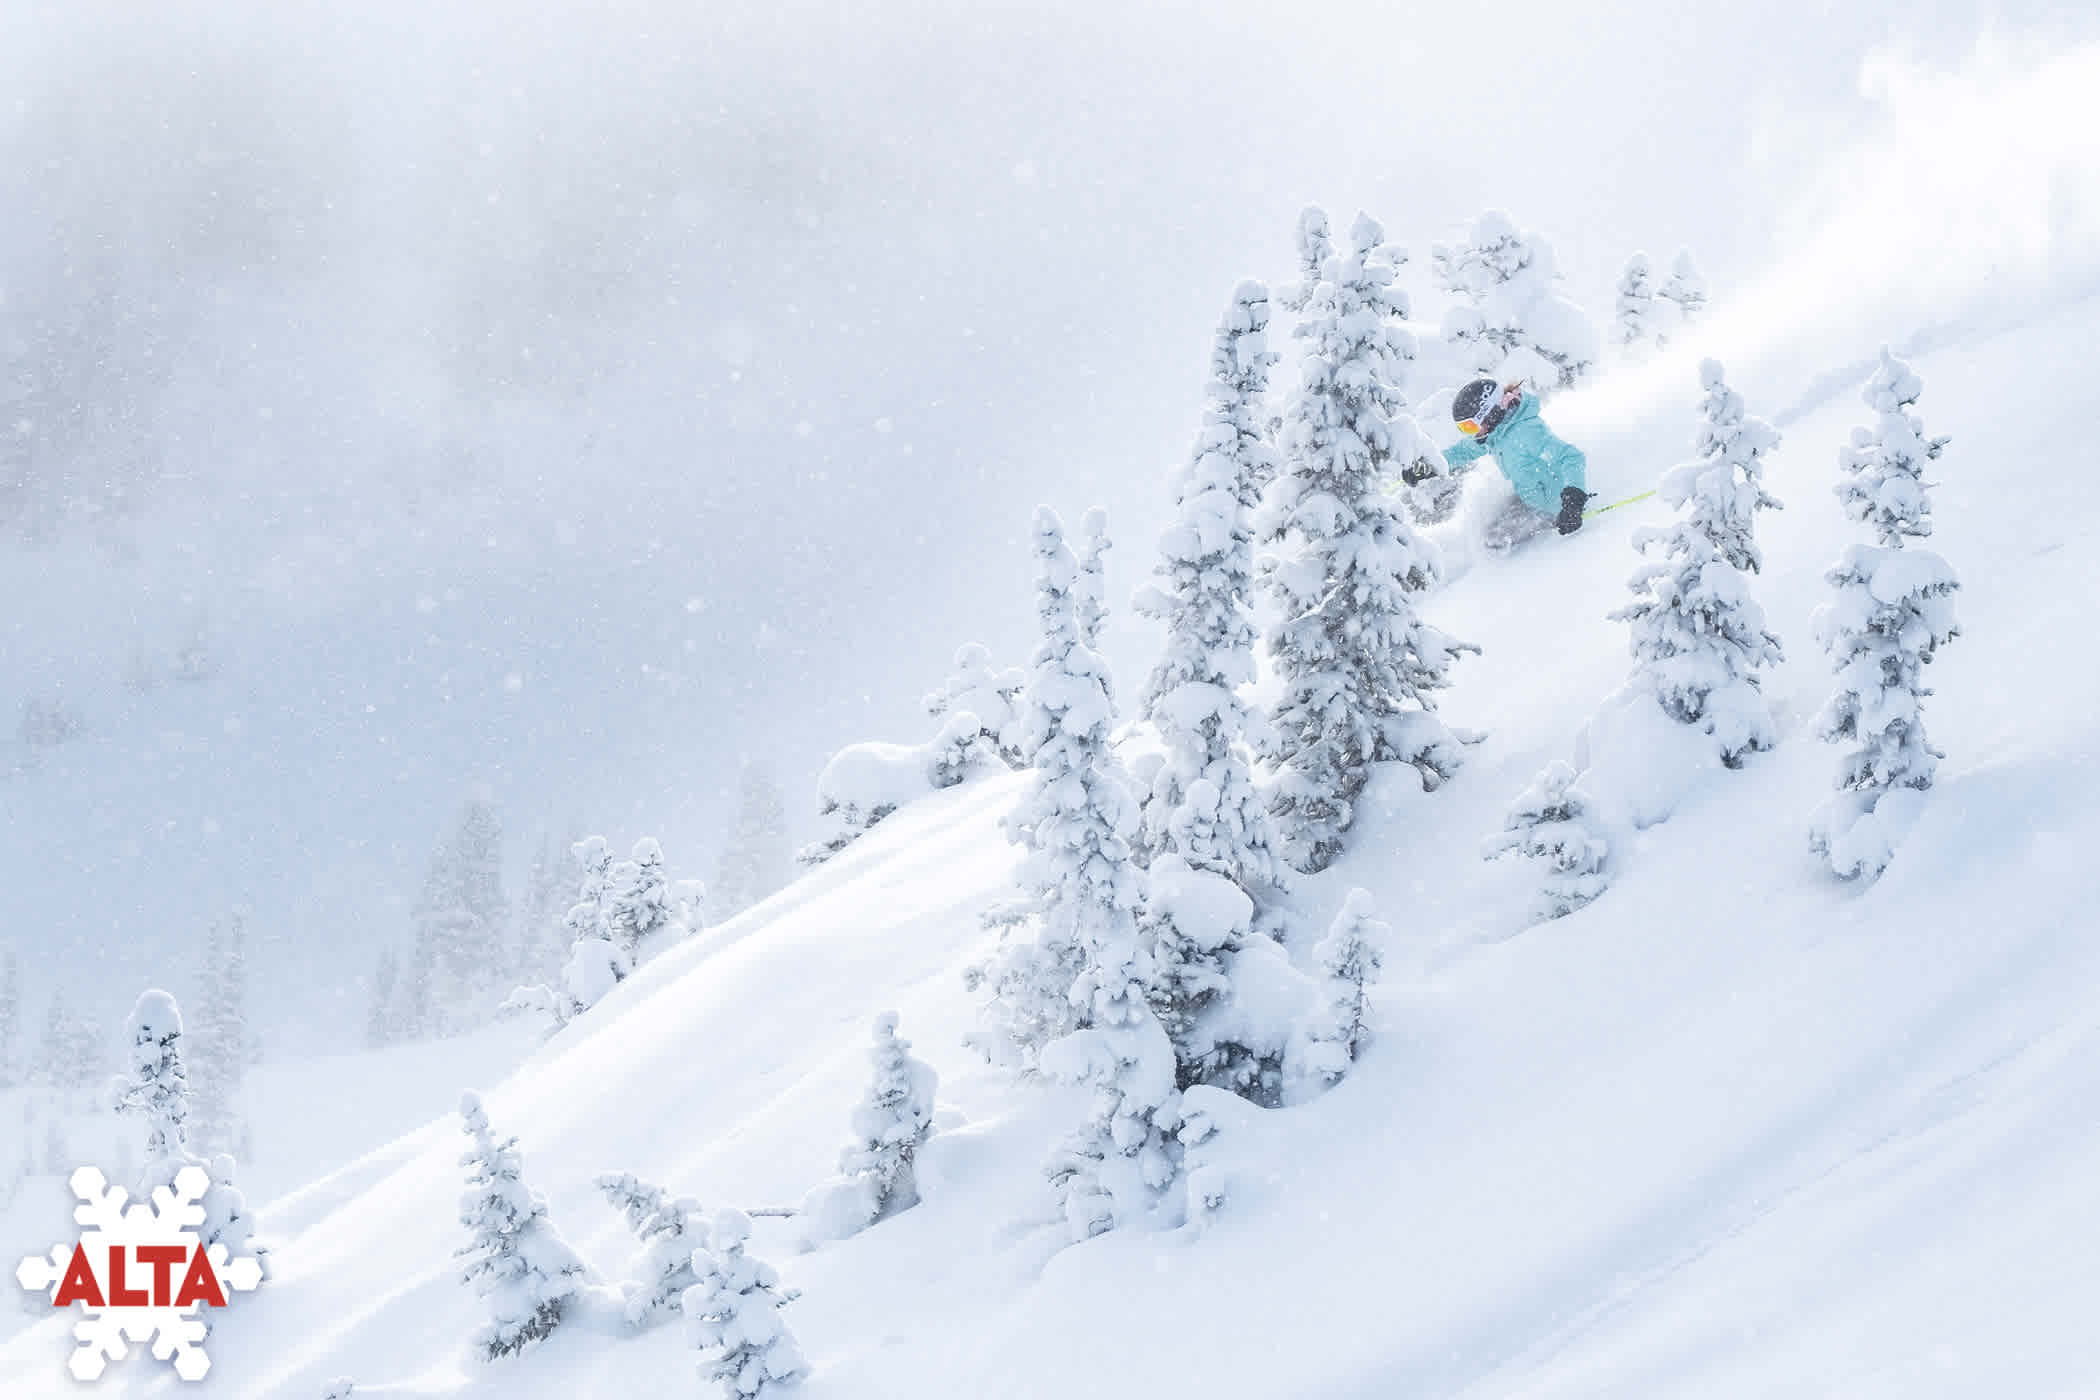 alta ski area tree skiing